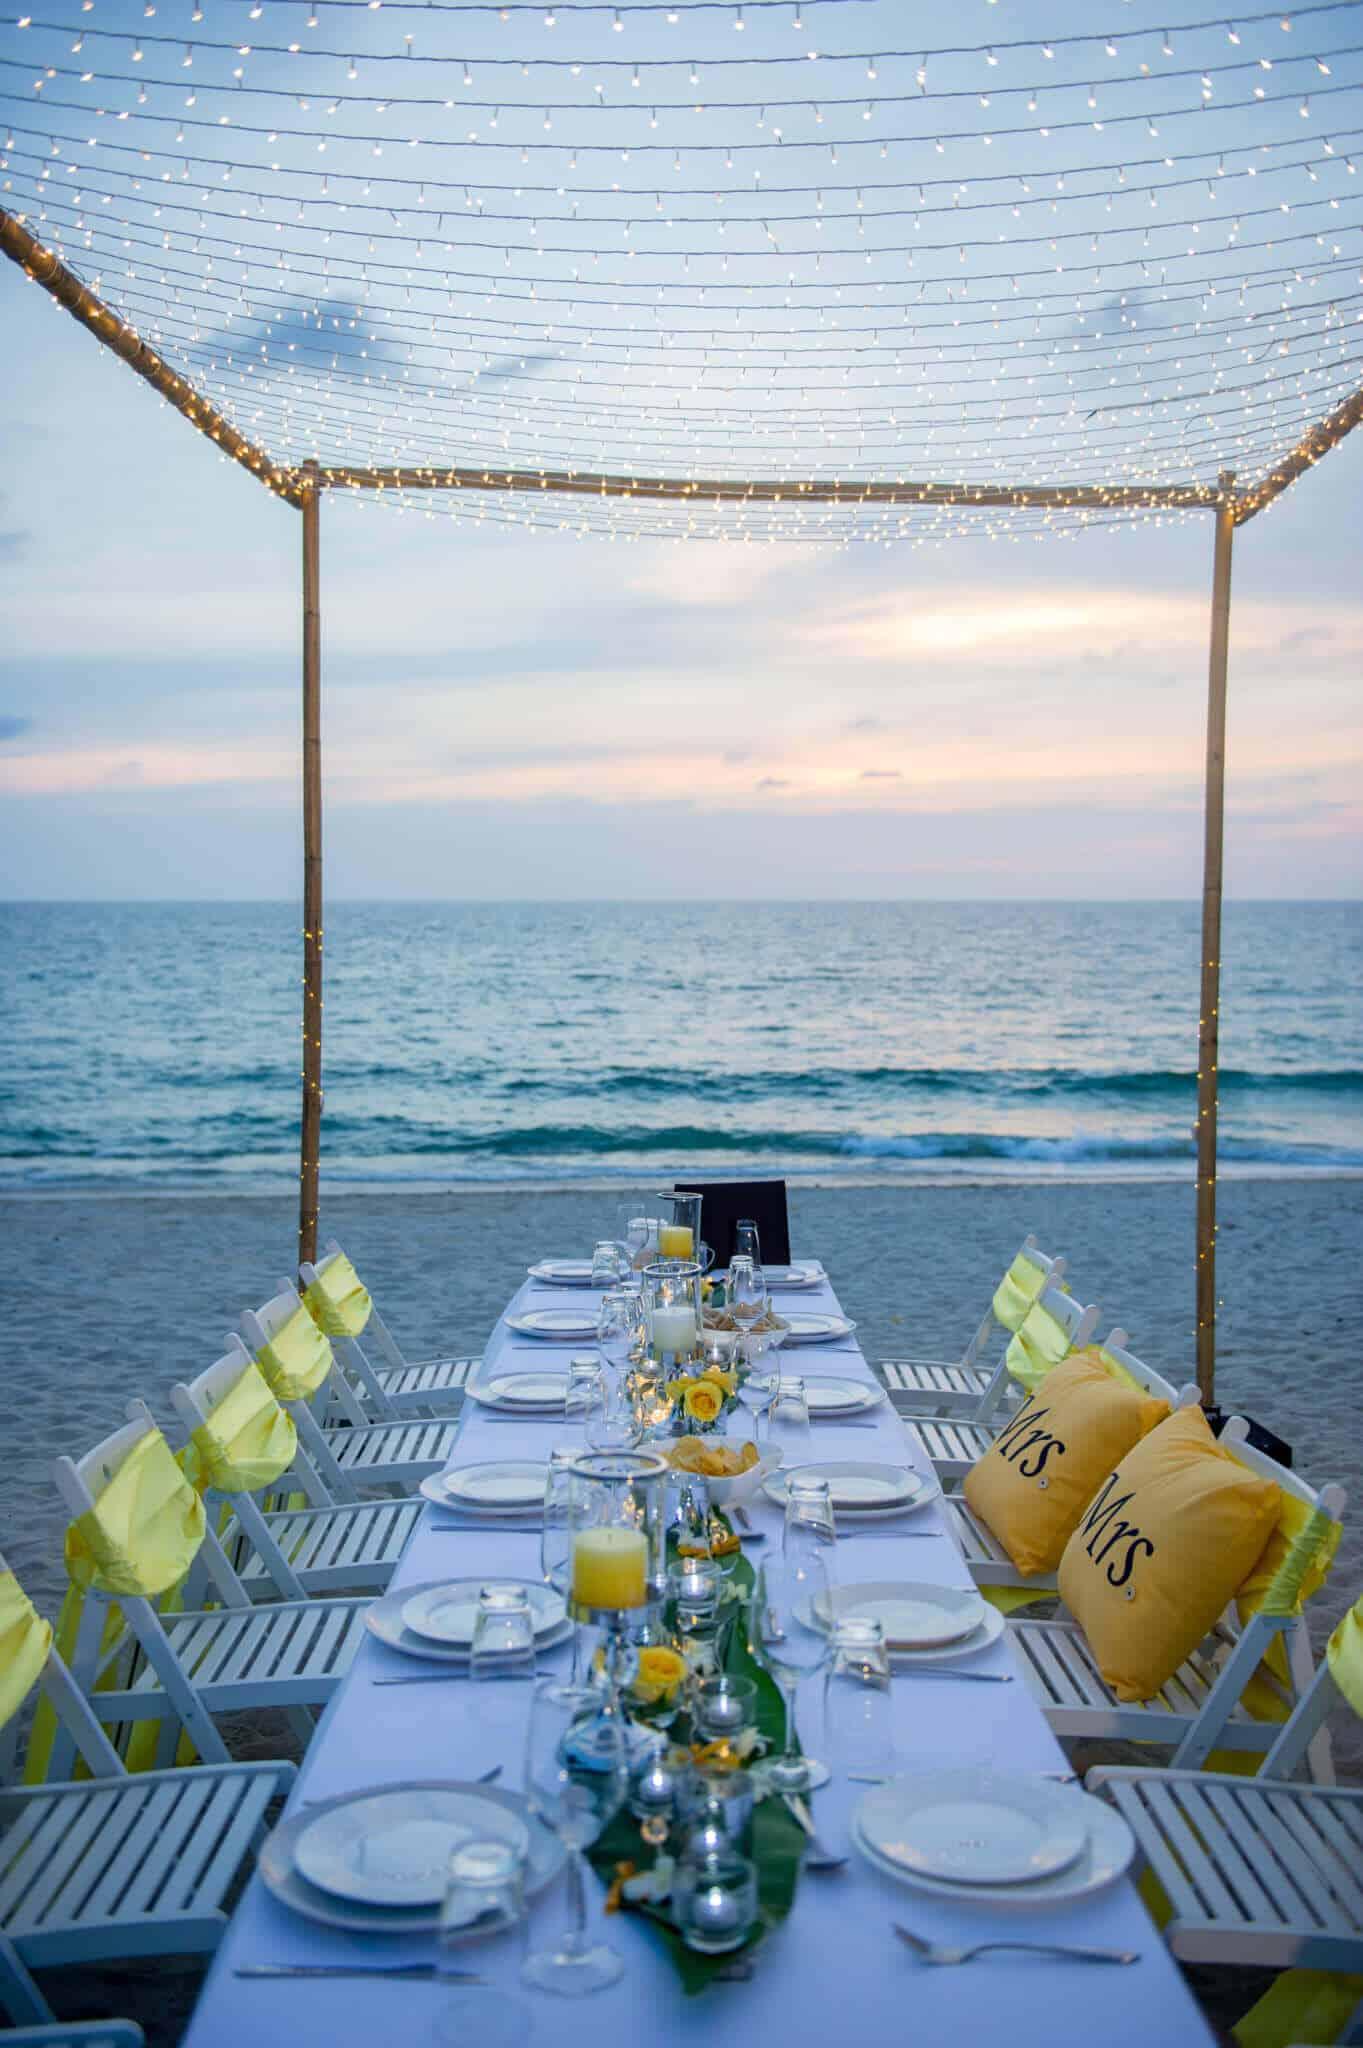 Beach Wedding Reception - Phuket Beach Wedding Beach Reception 26